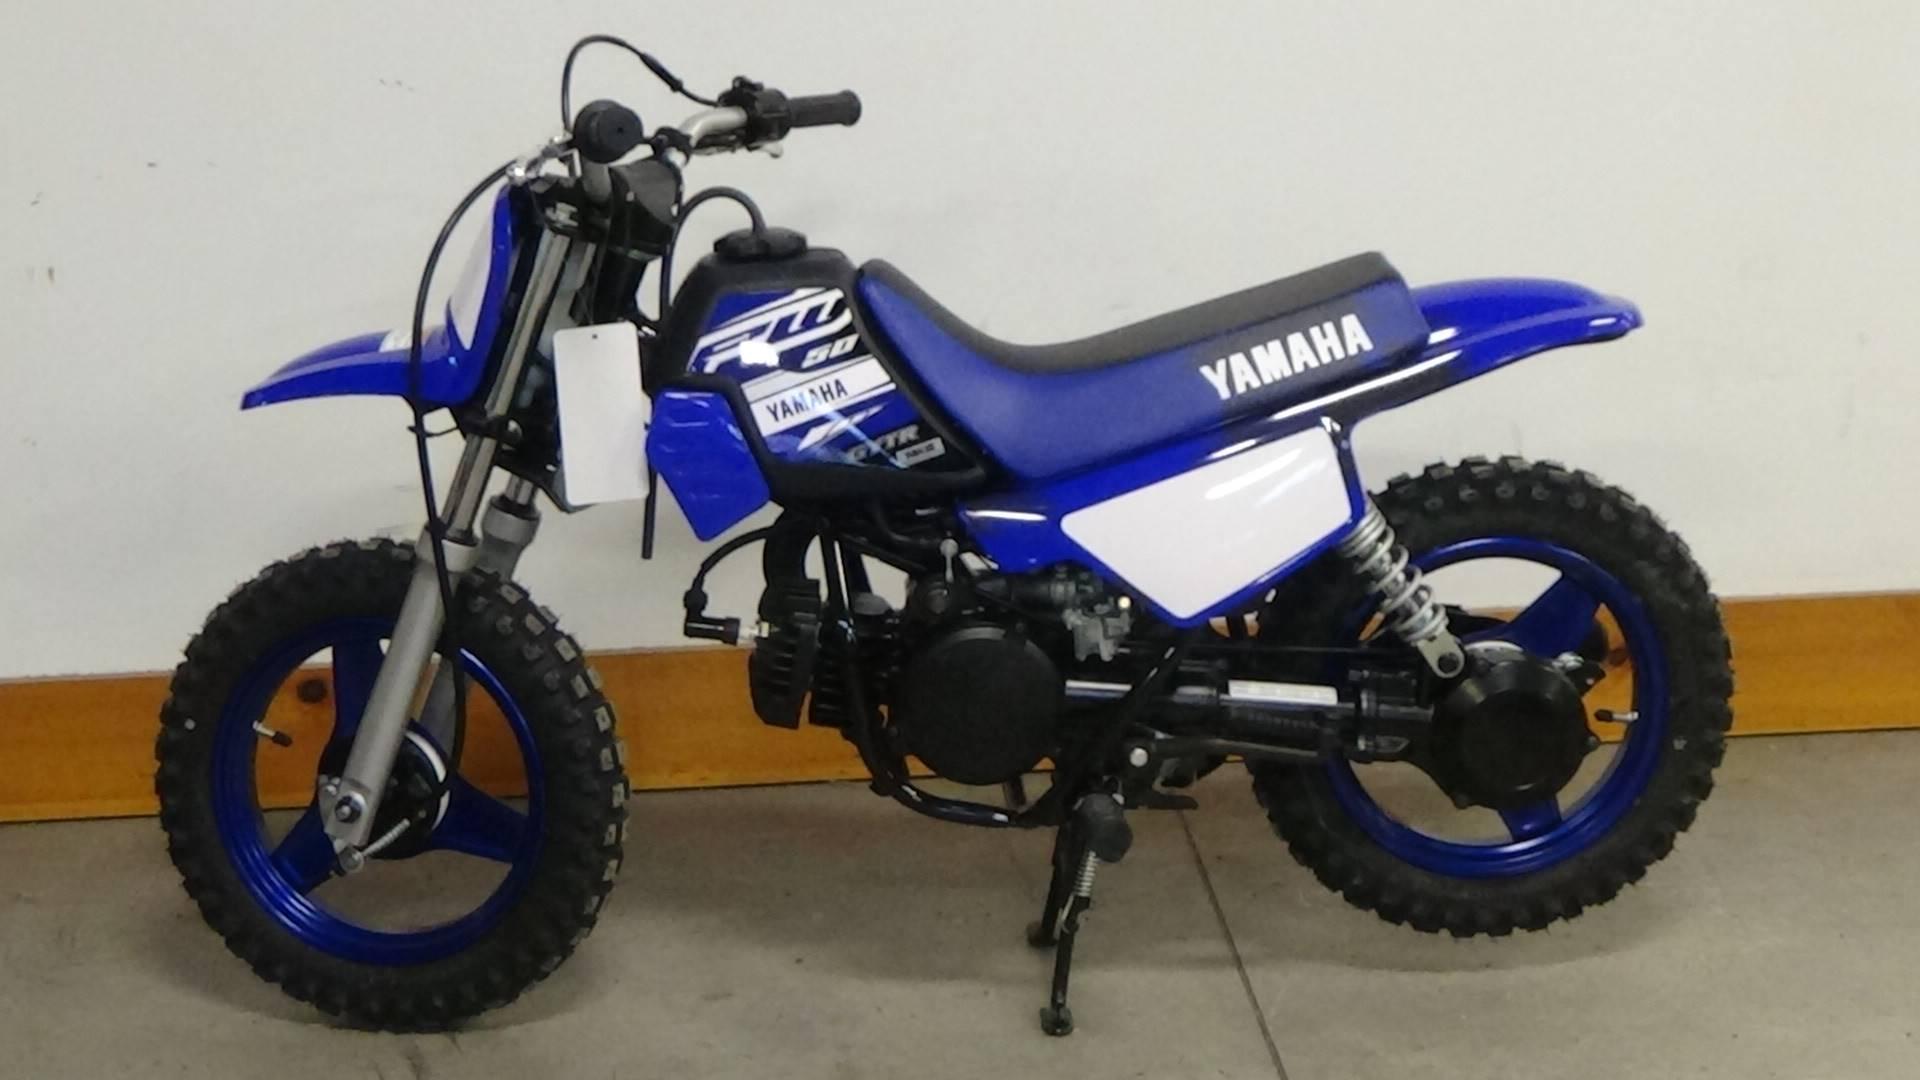 2019 Yamaha PW50 for sale 10606